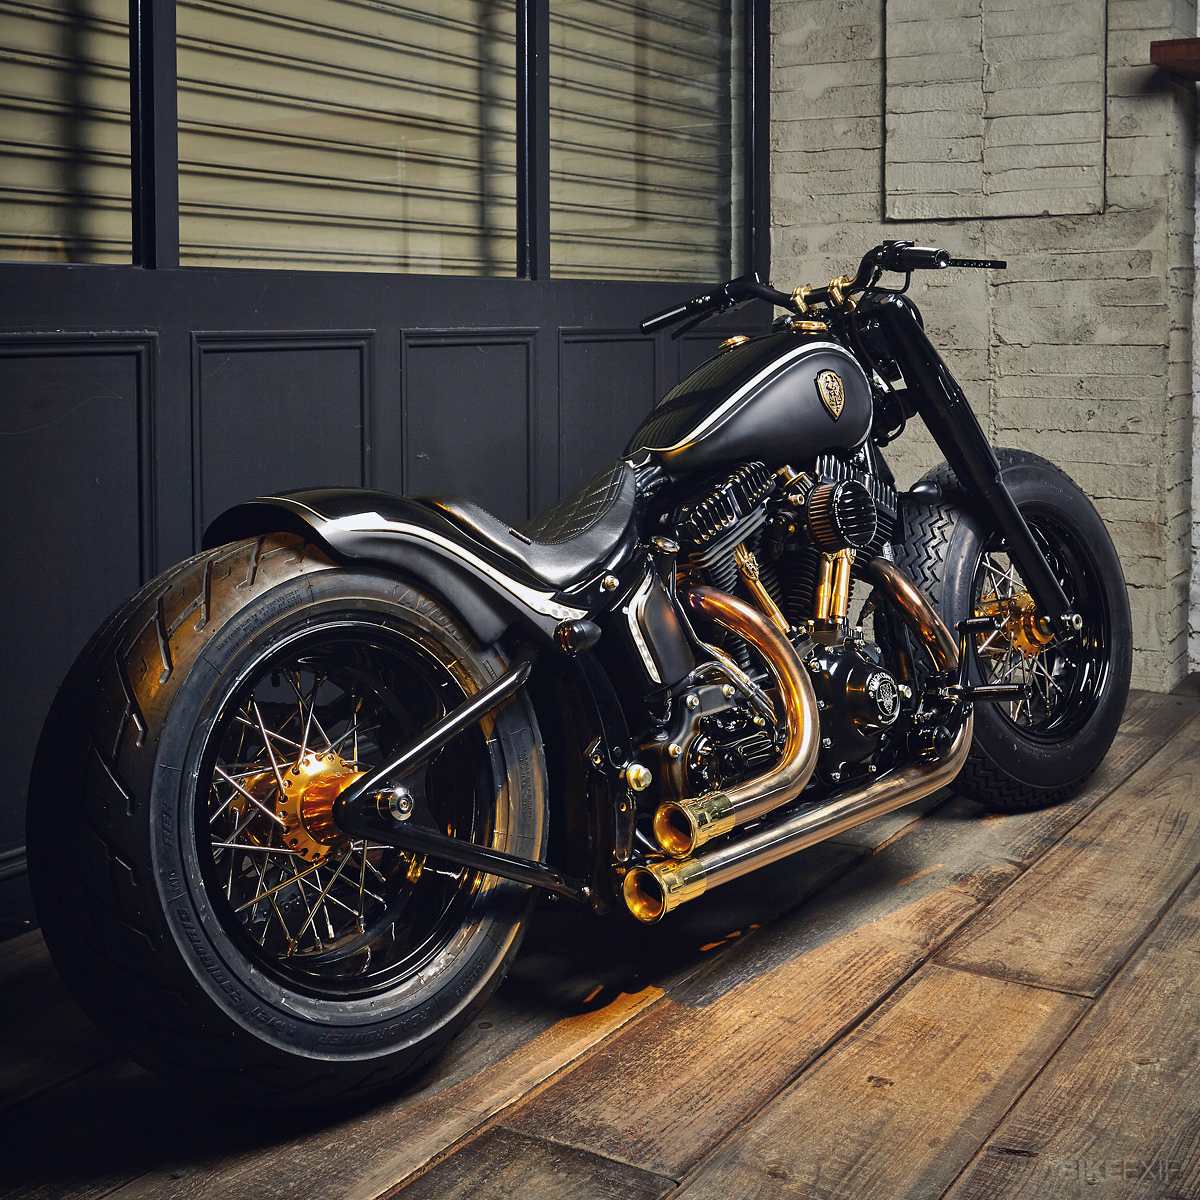 harley davidson custom bike black mammoth fat spoke wheels. Black Bedroom Furniture Sets. Home Design Ideas